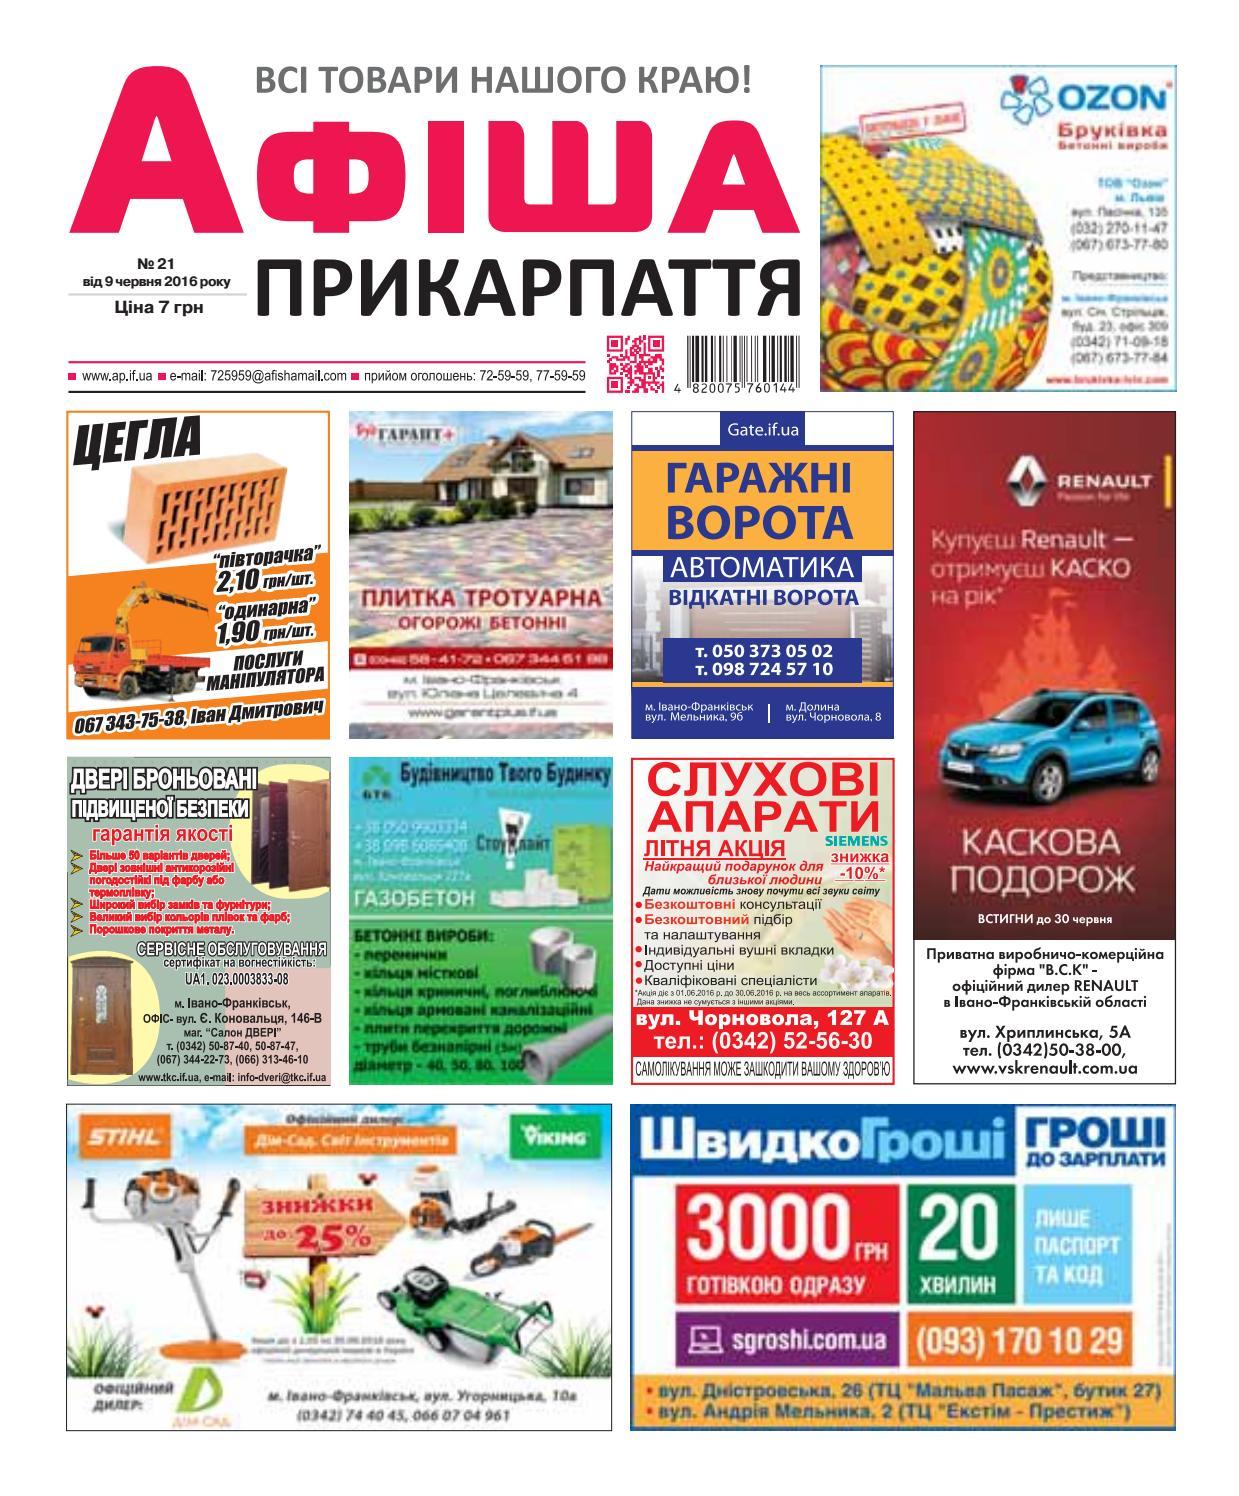 Афіша ПРИКАРПАТТЯ №21 by Olya Olya - issuu 9cf361bc0437f